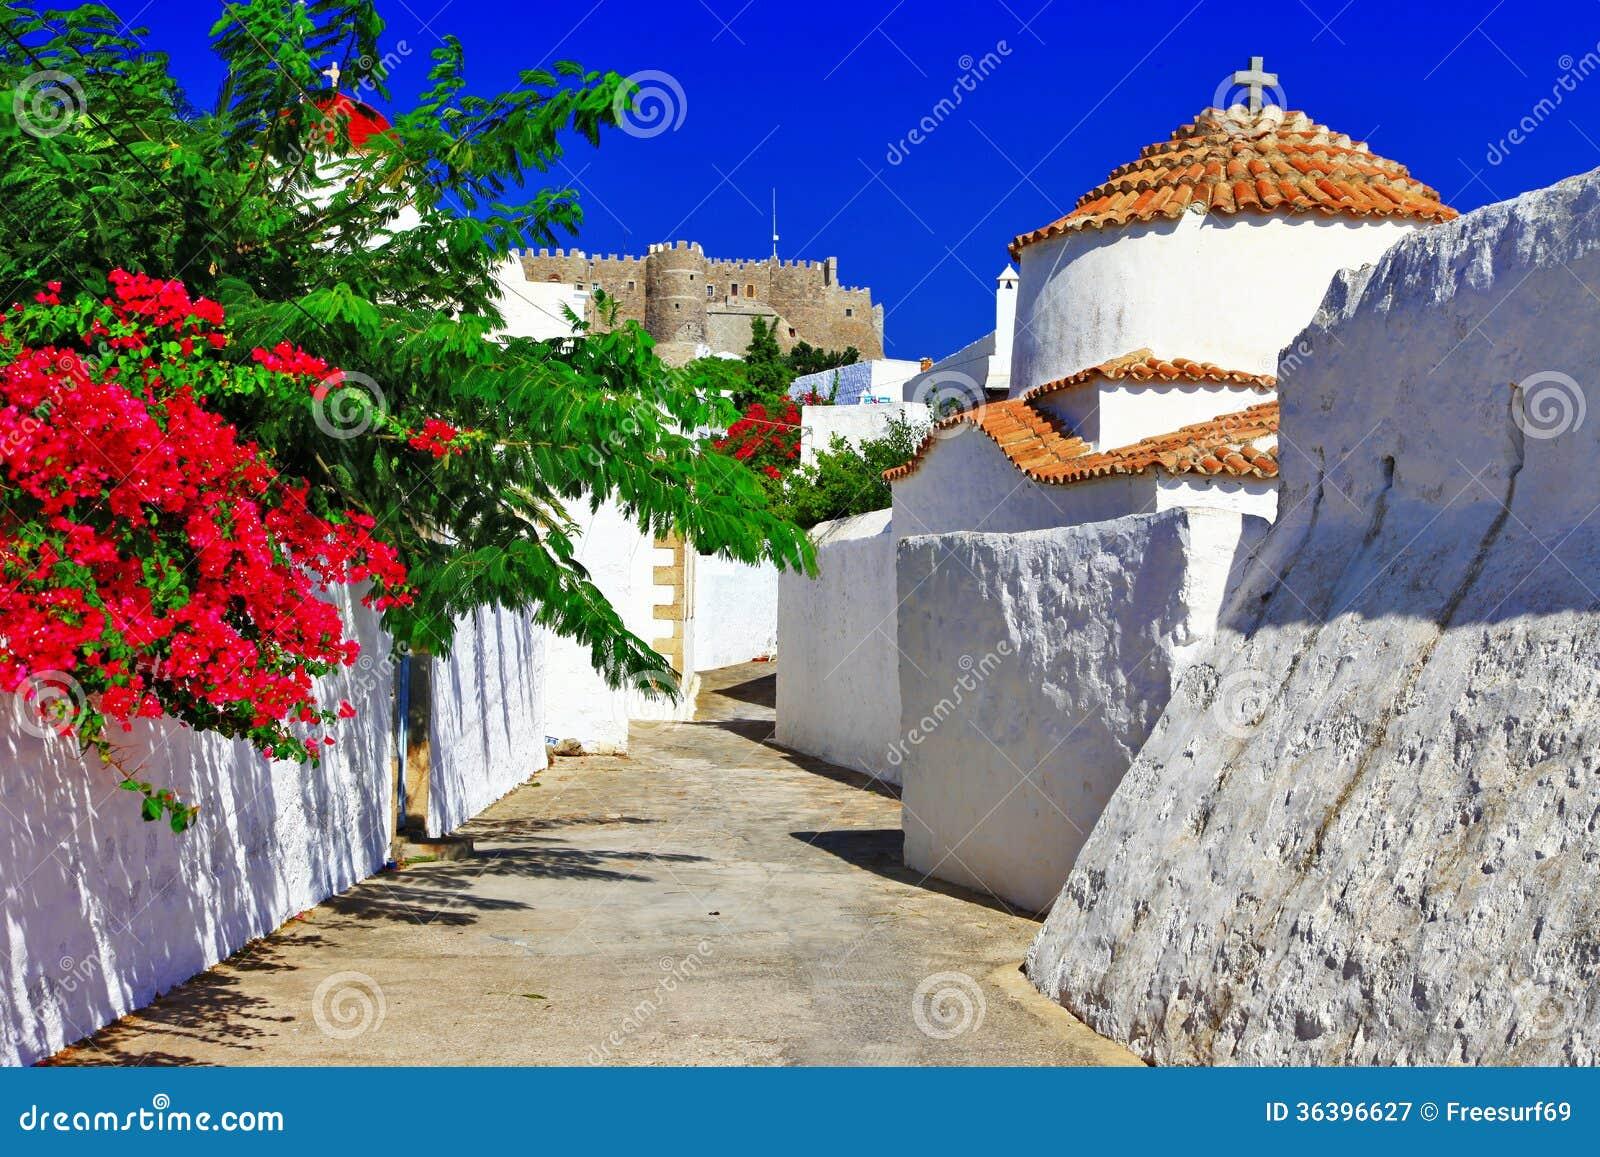 Greece.Patmos island.